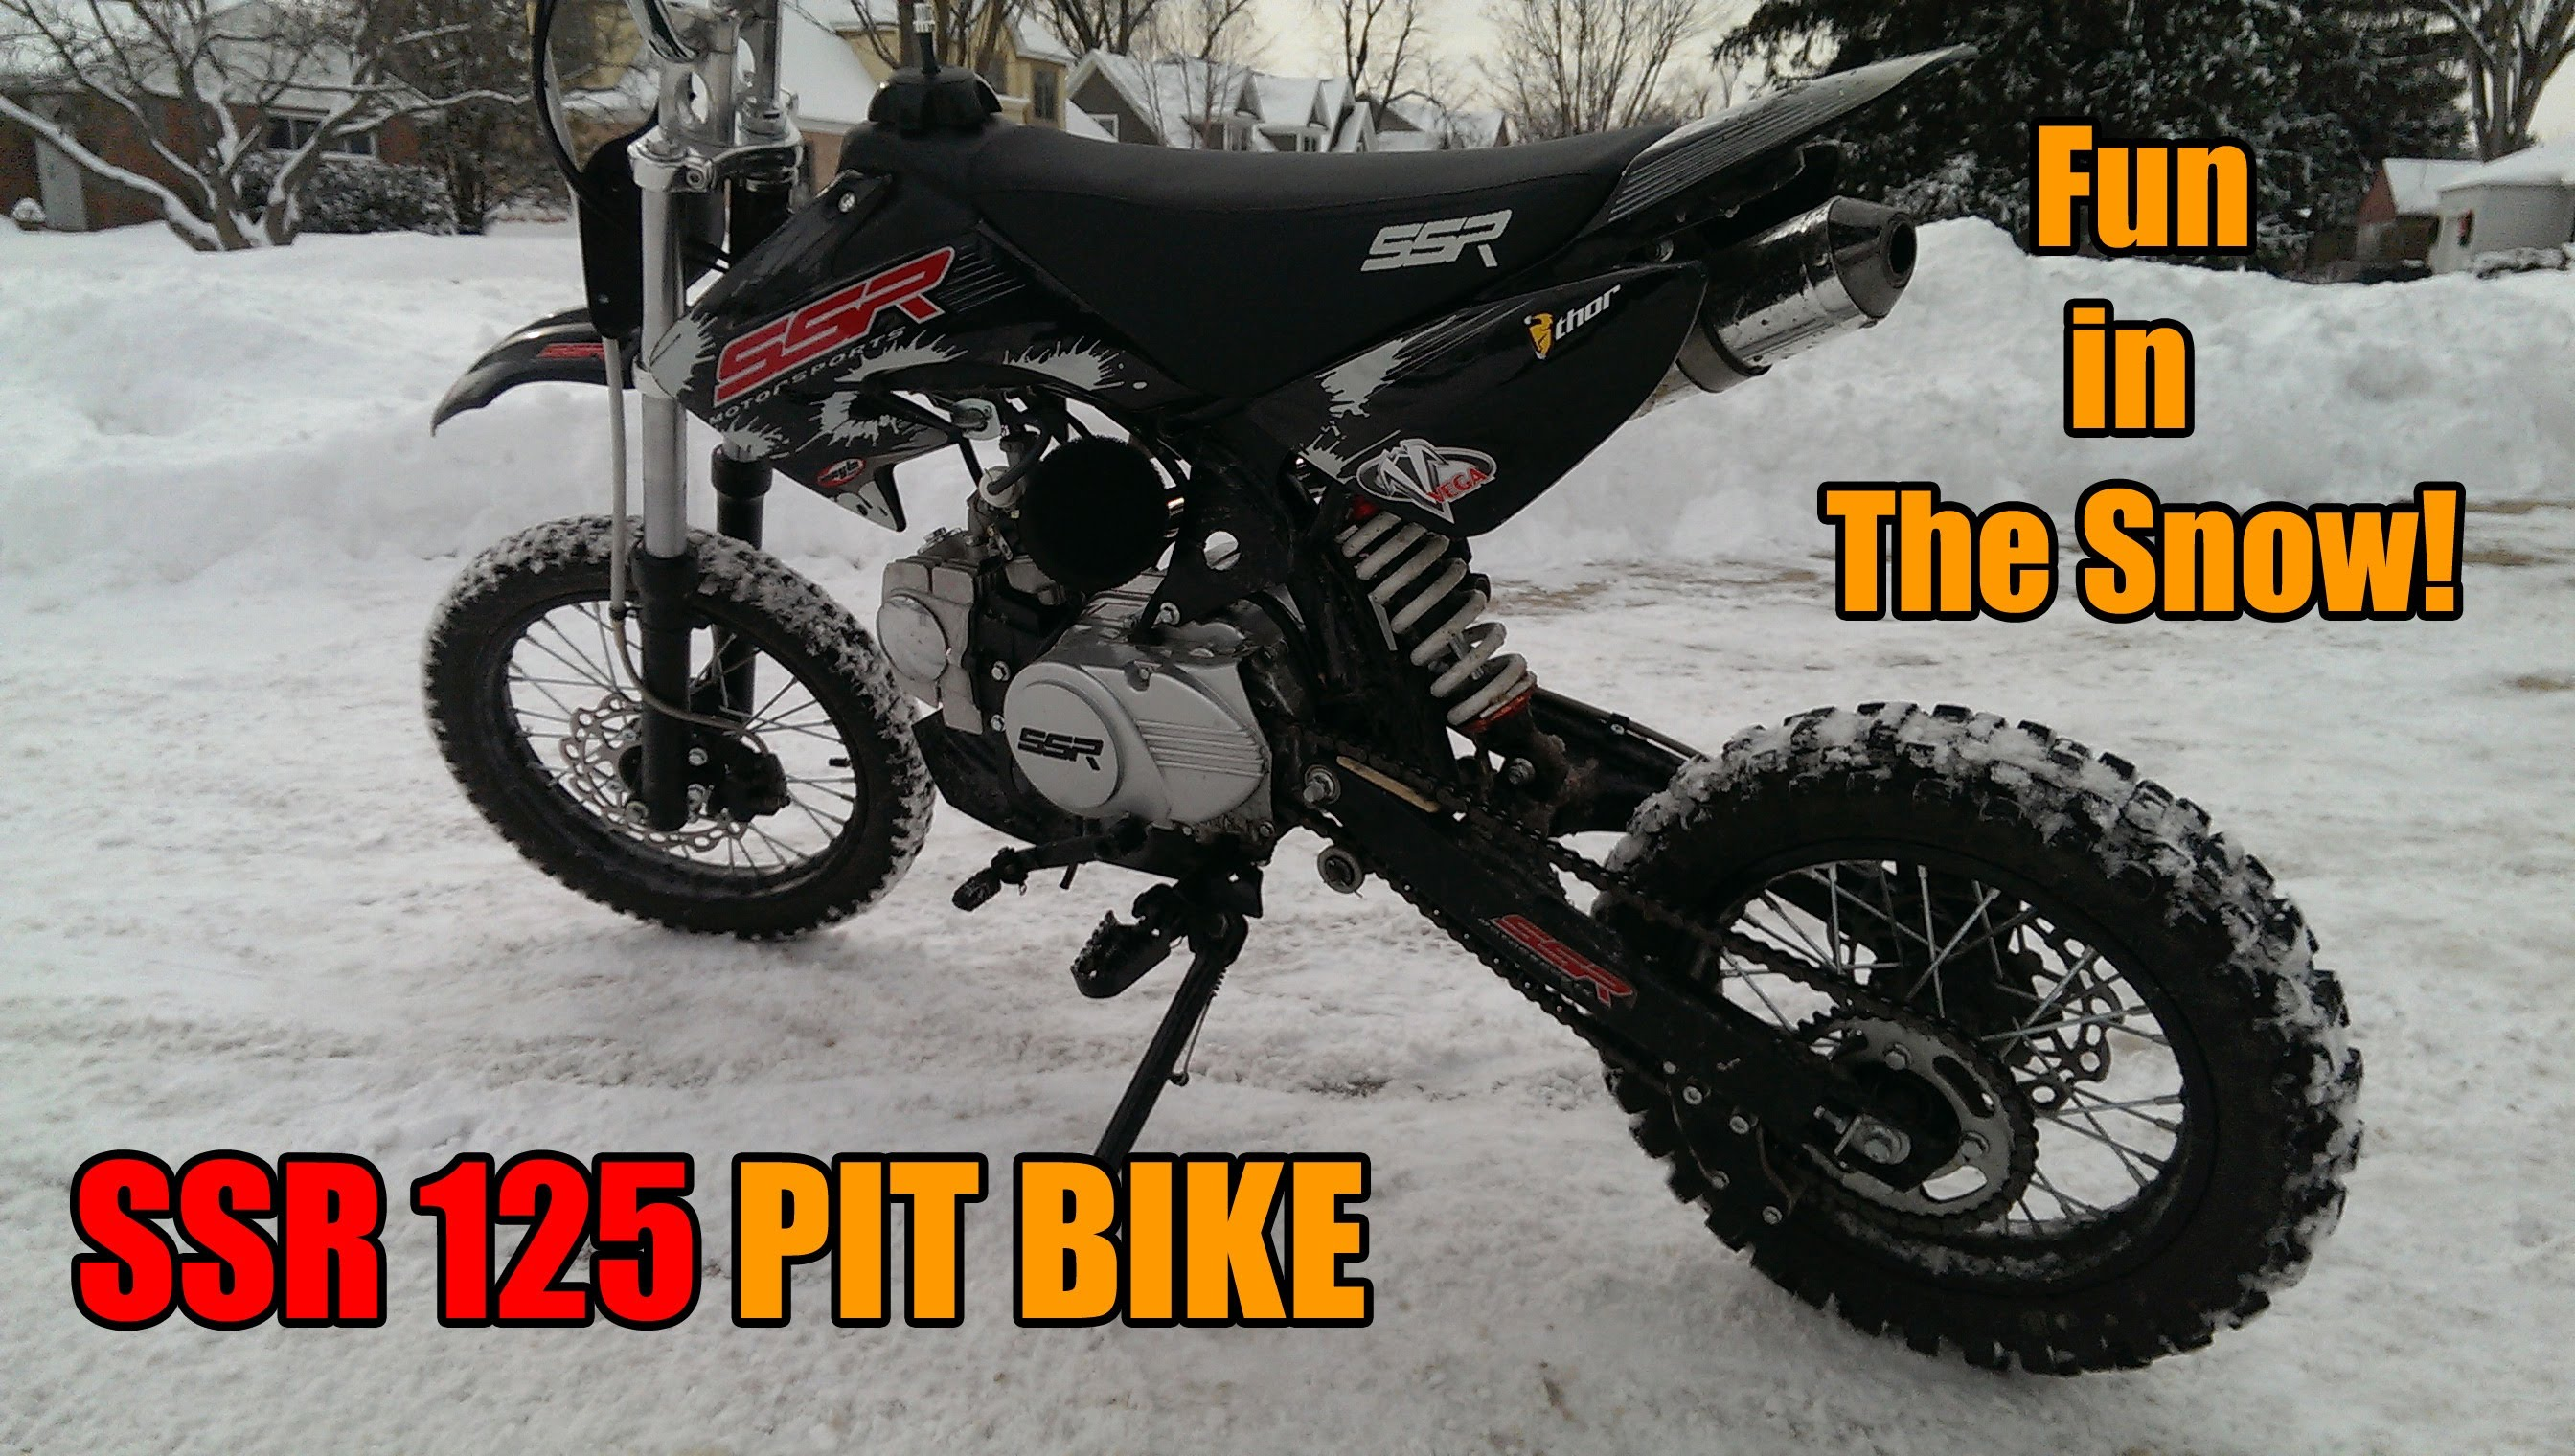 Ssr Pit Bike Fun In The Snow